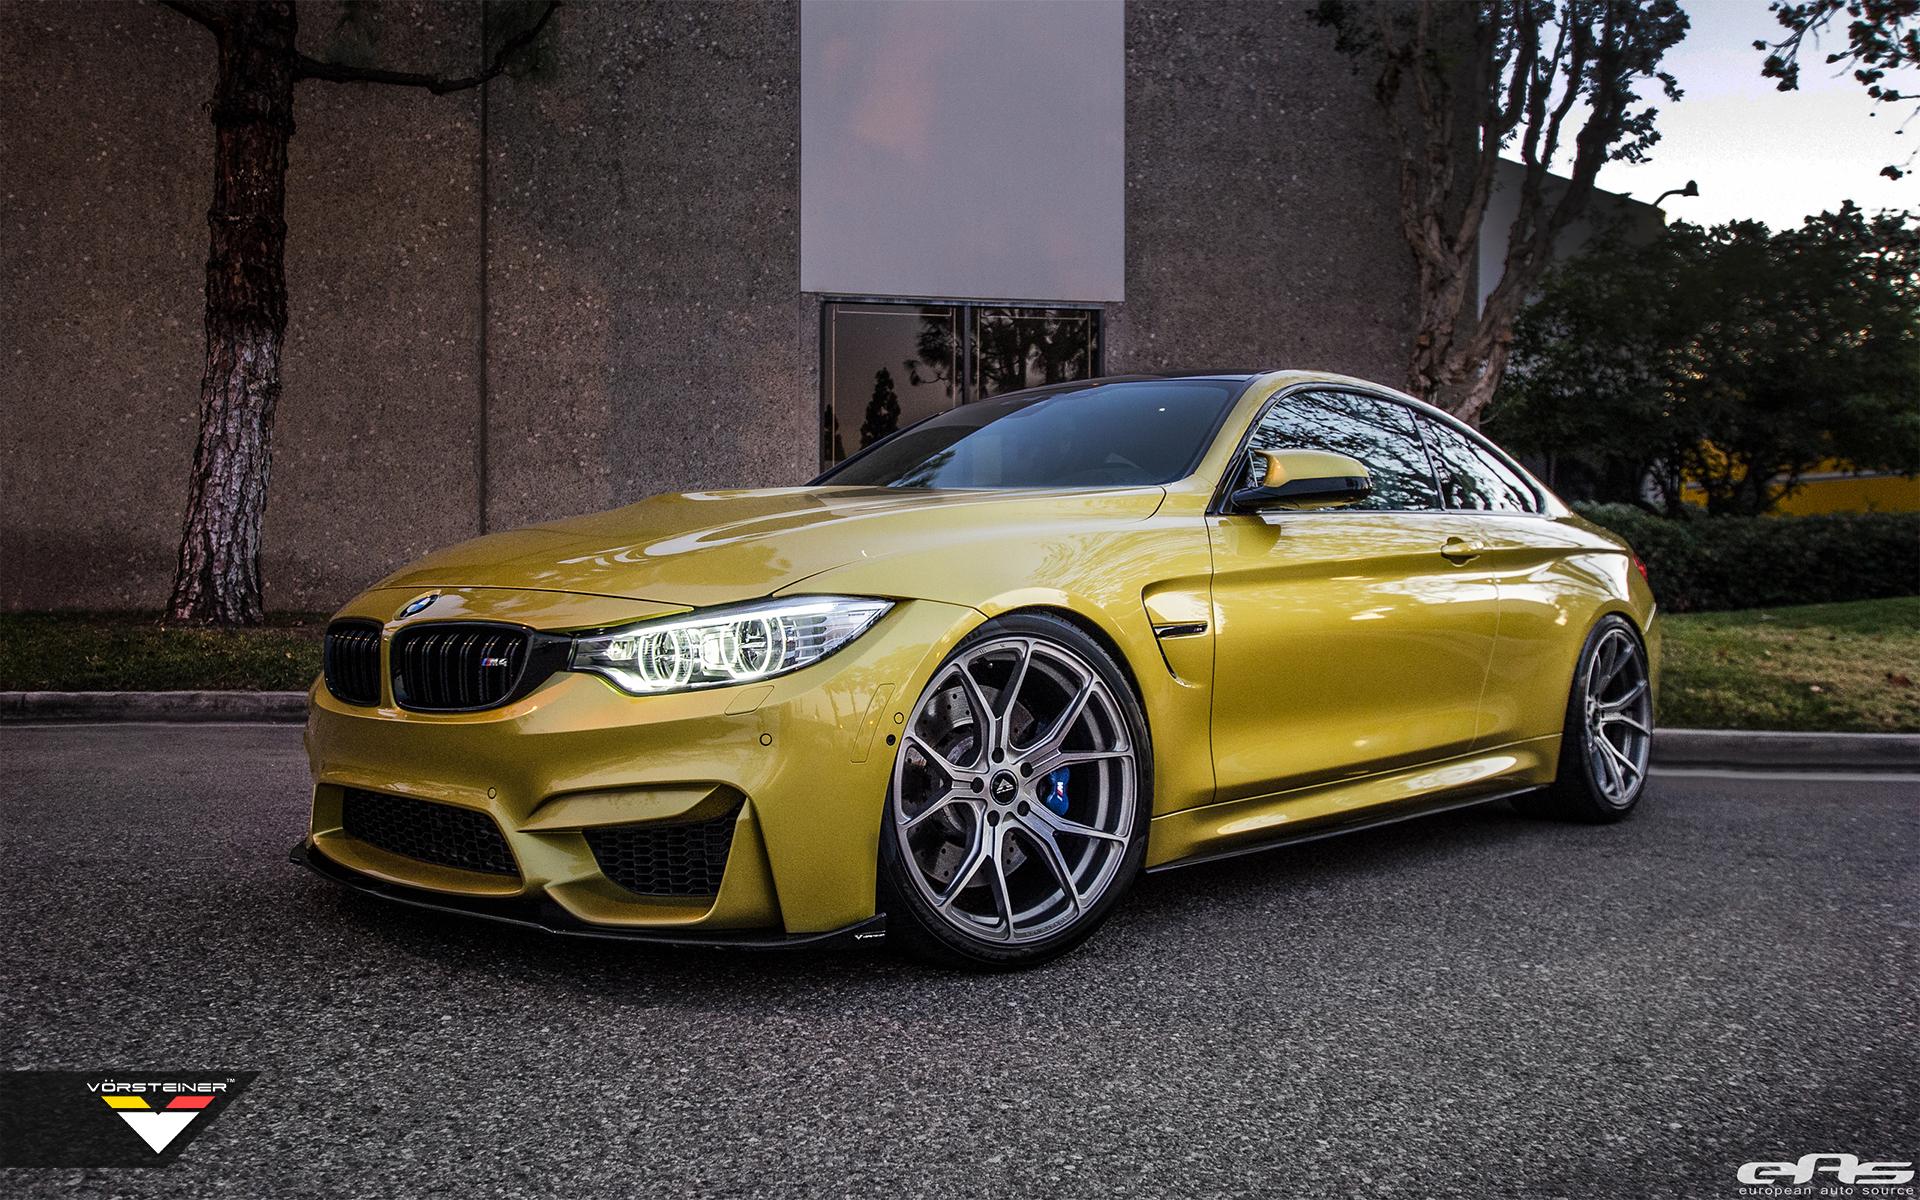 Austin Yellow BMW F82 M4 By European Auto Source 1